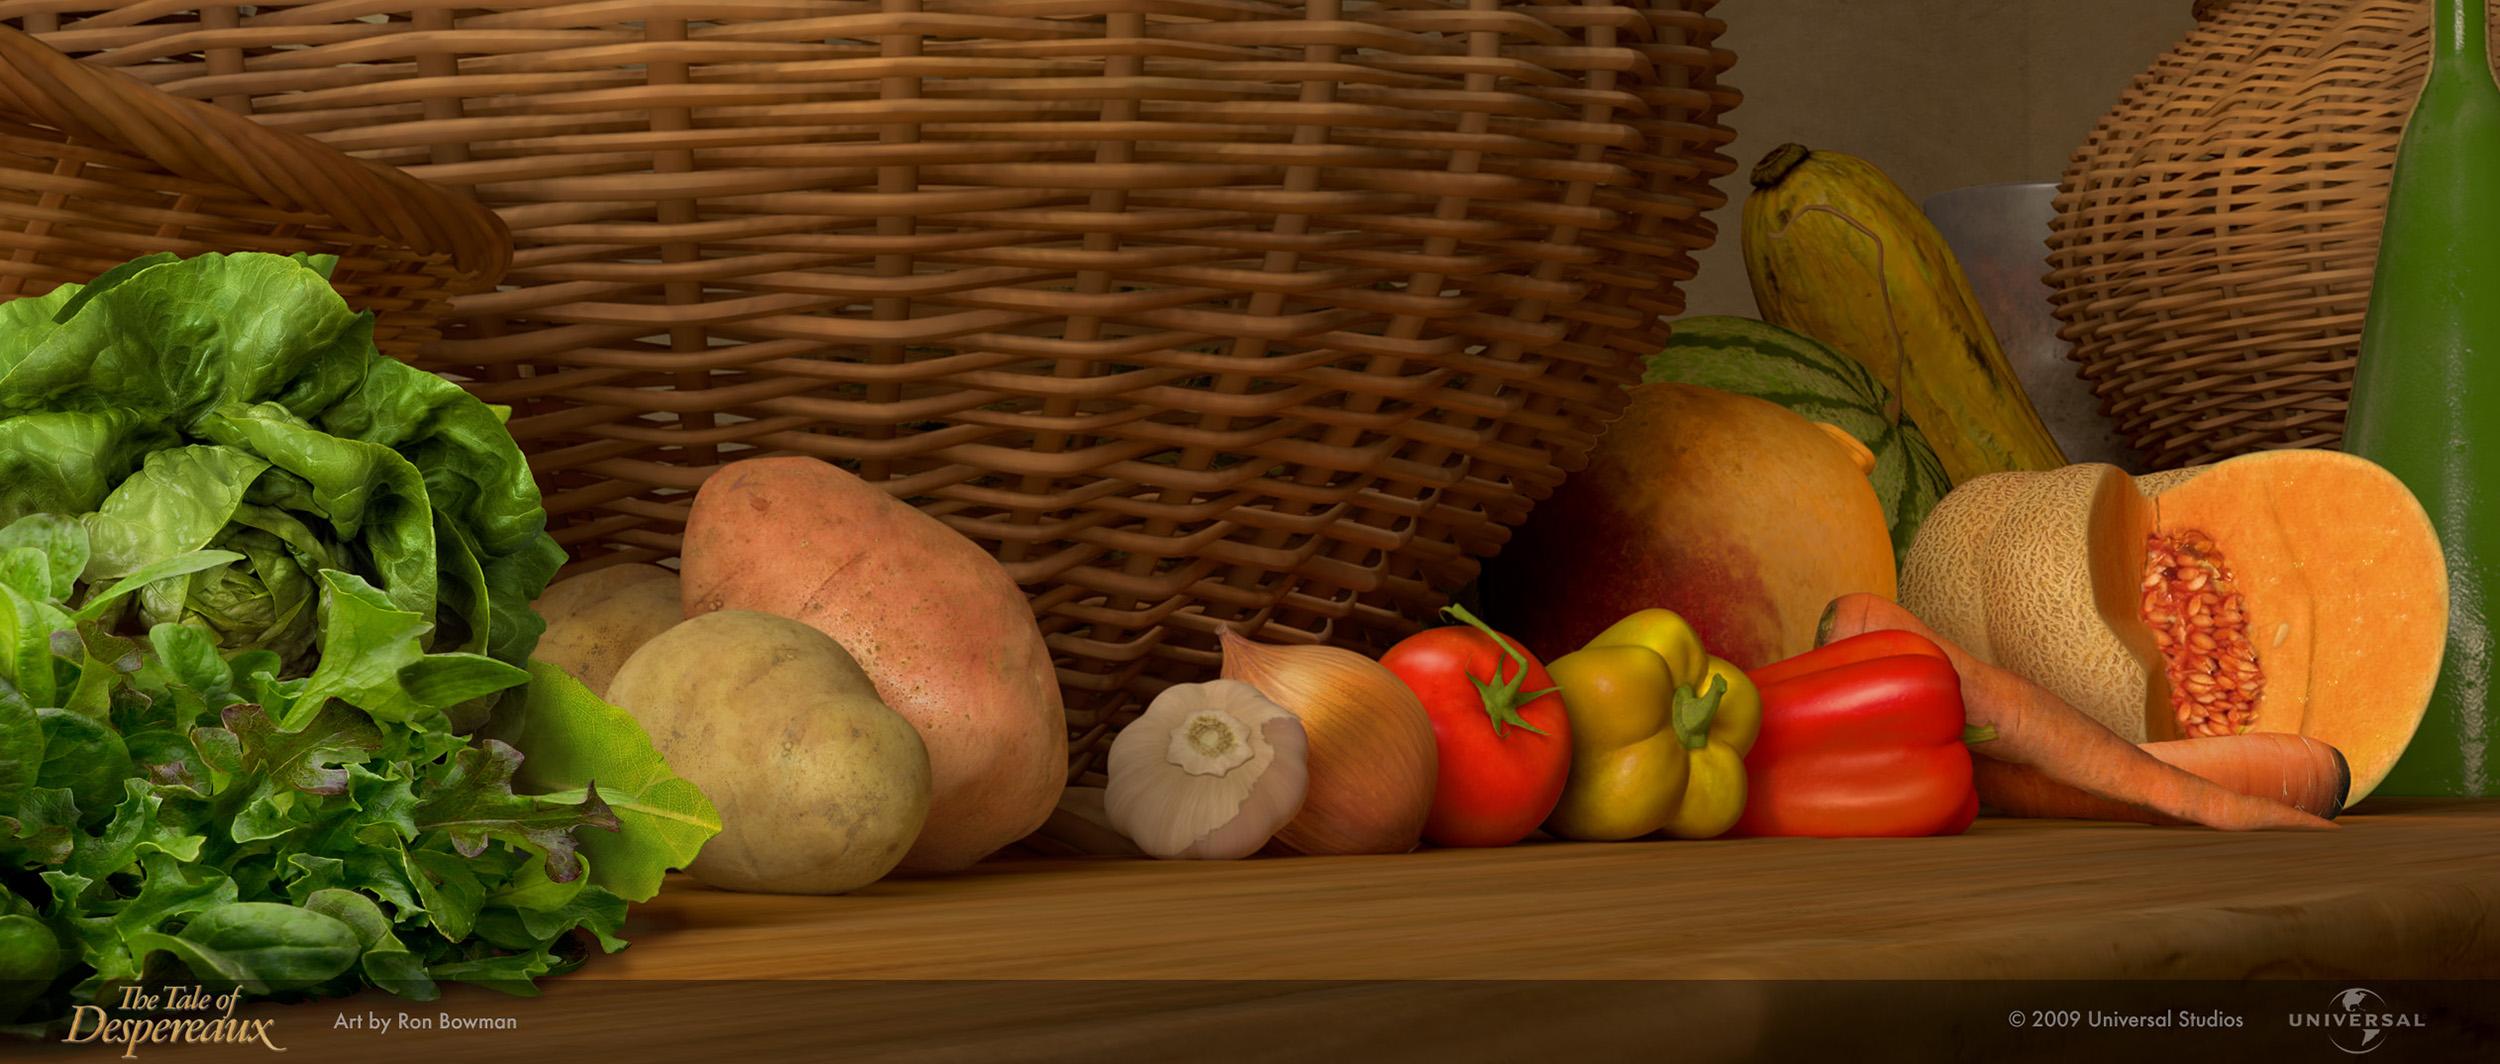 despereaux_fruit_table_comp.jpg